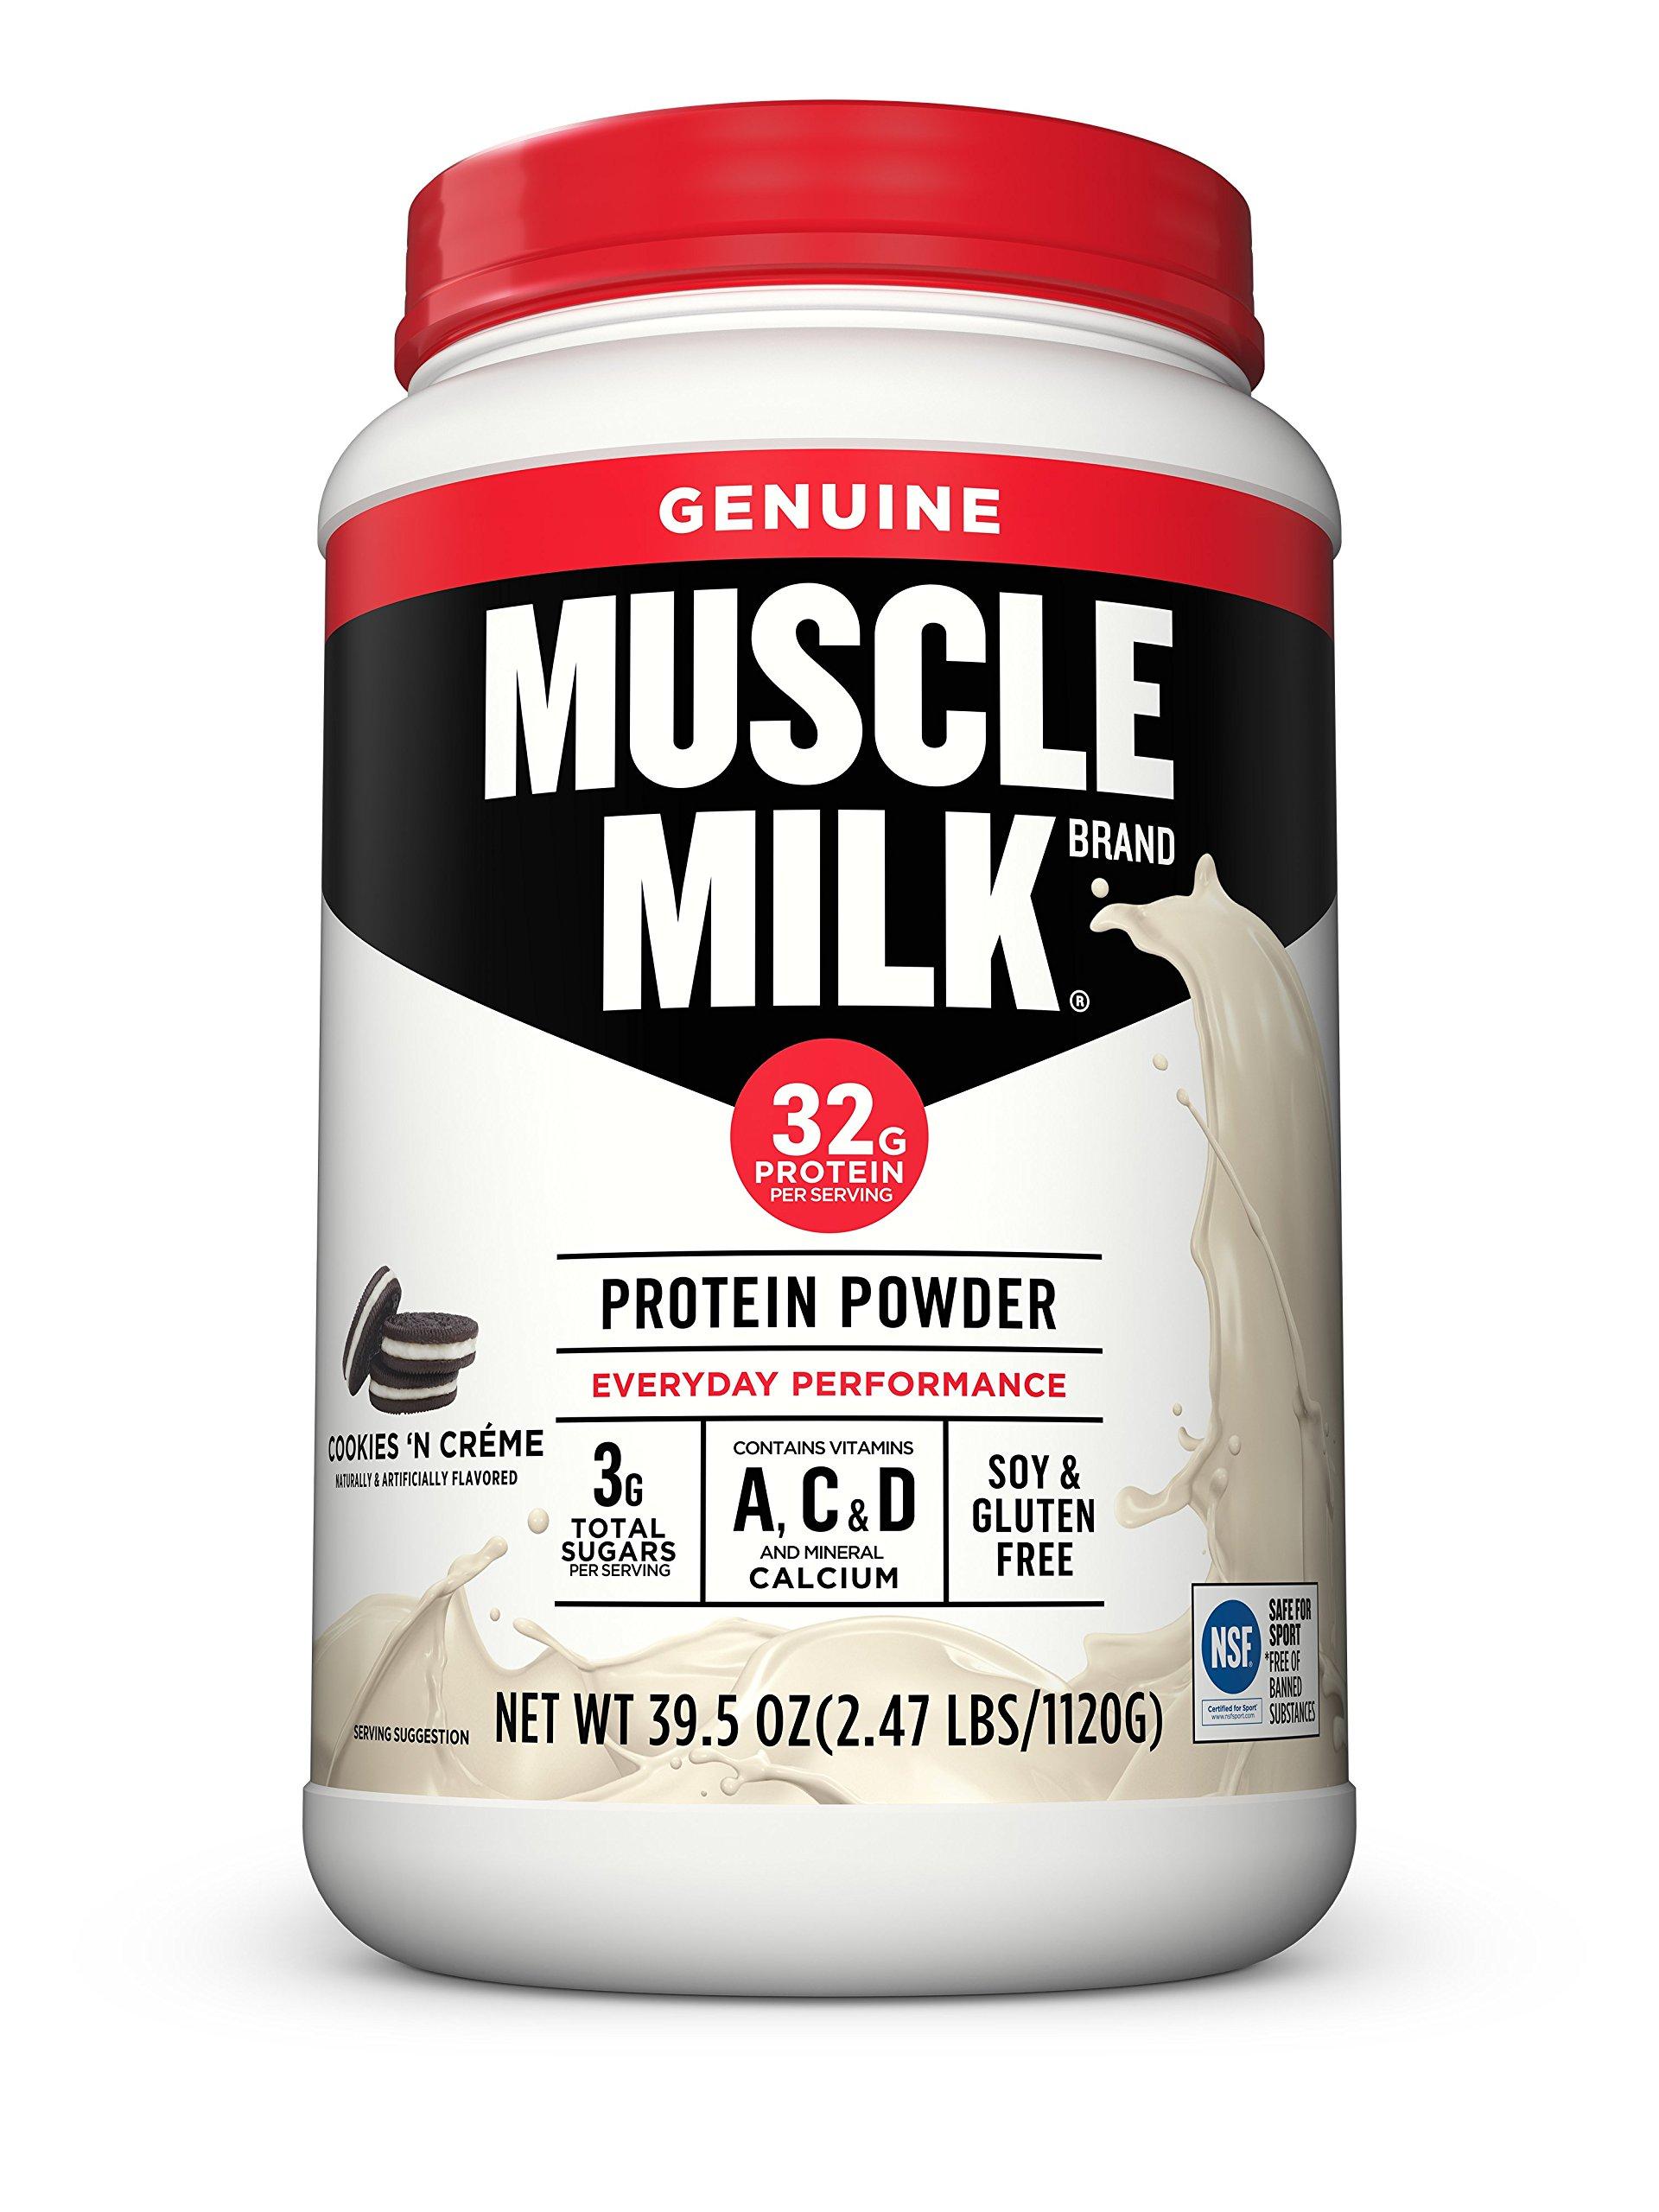 Muscle Milk Genuine Protein Powder, Cookies 'N Crème, 32g Protein, 2.47 Pound by CytoSport